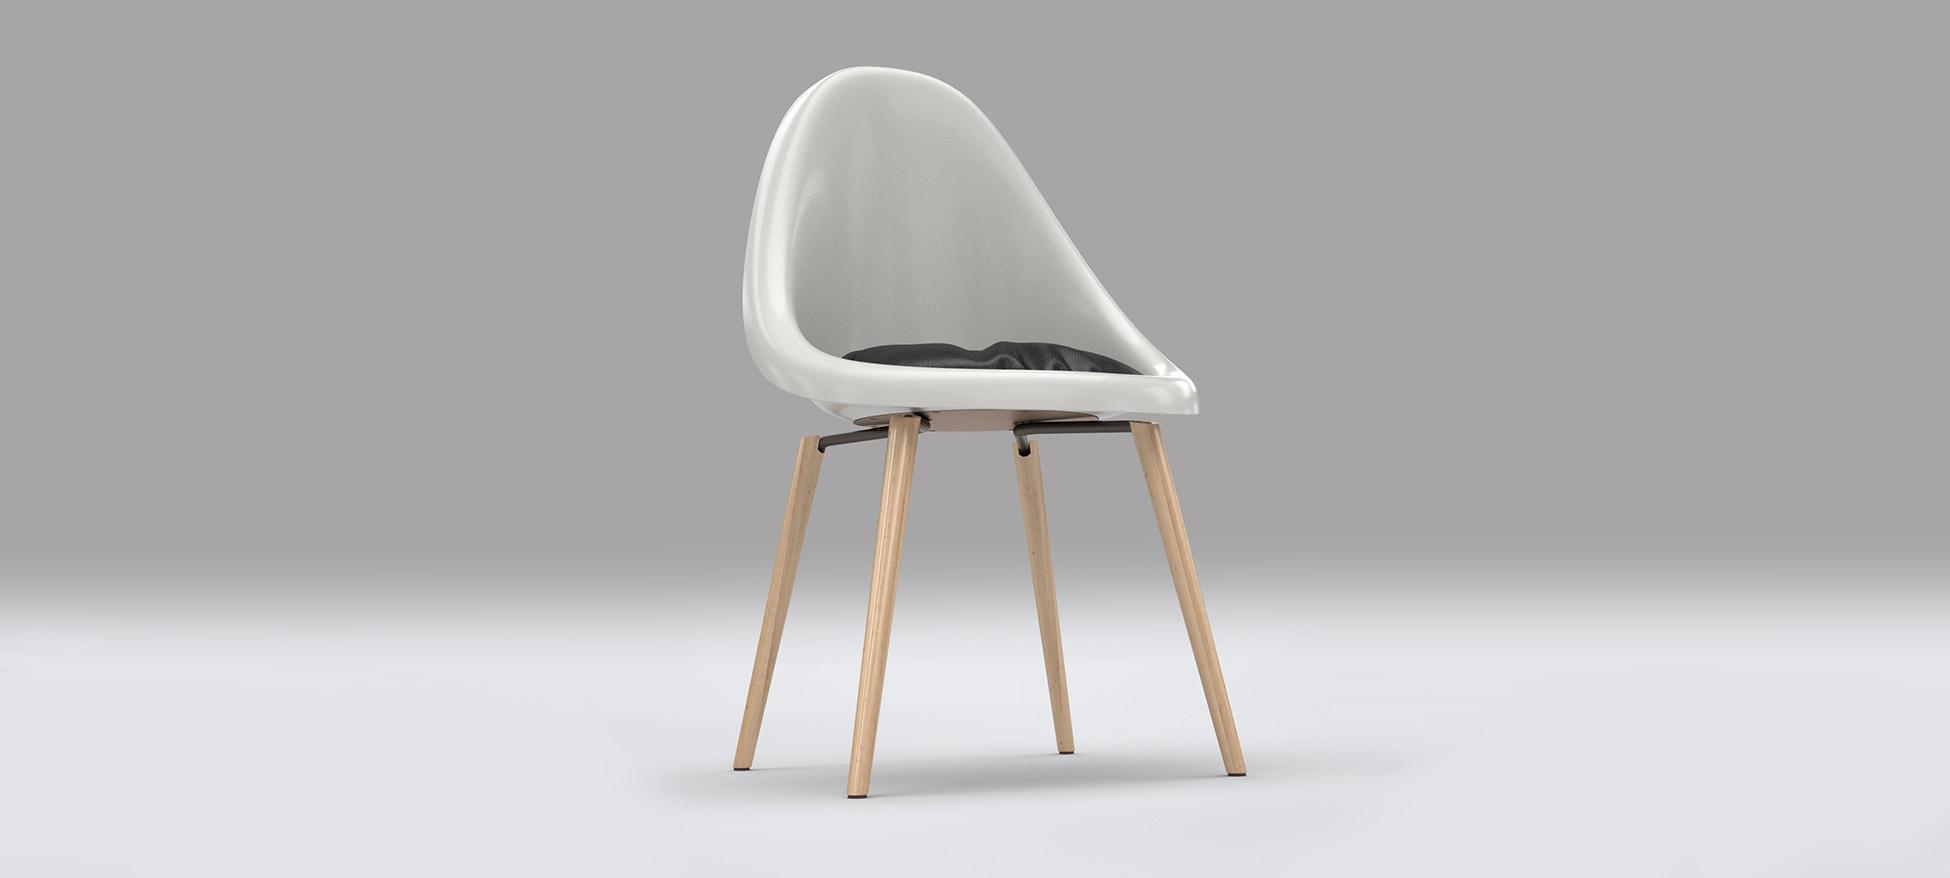 Chair_v02 (1).jpg